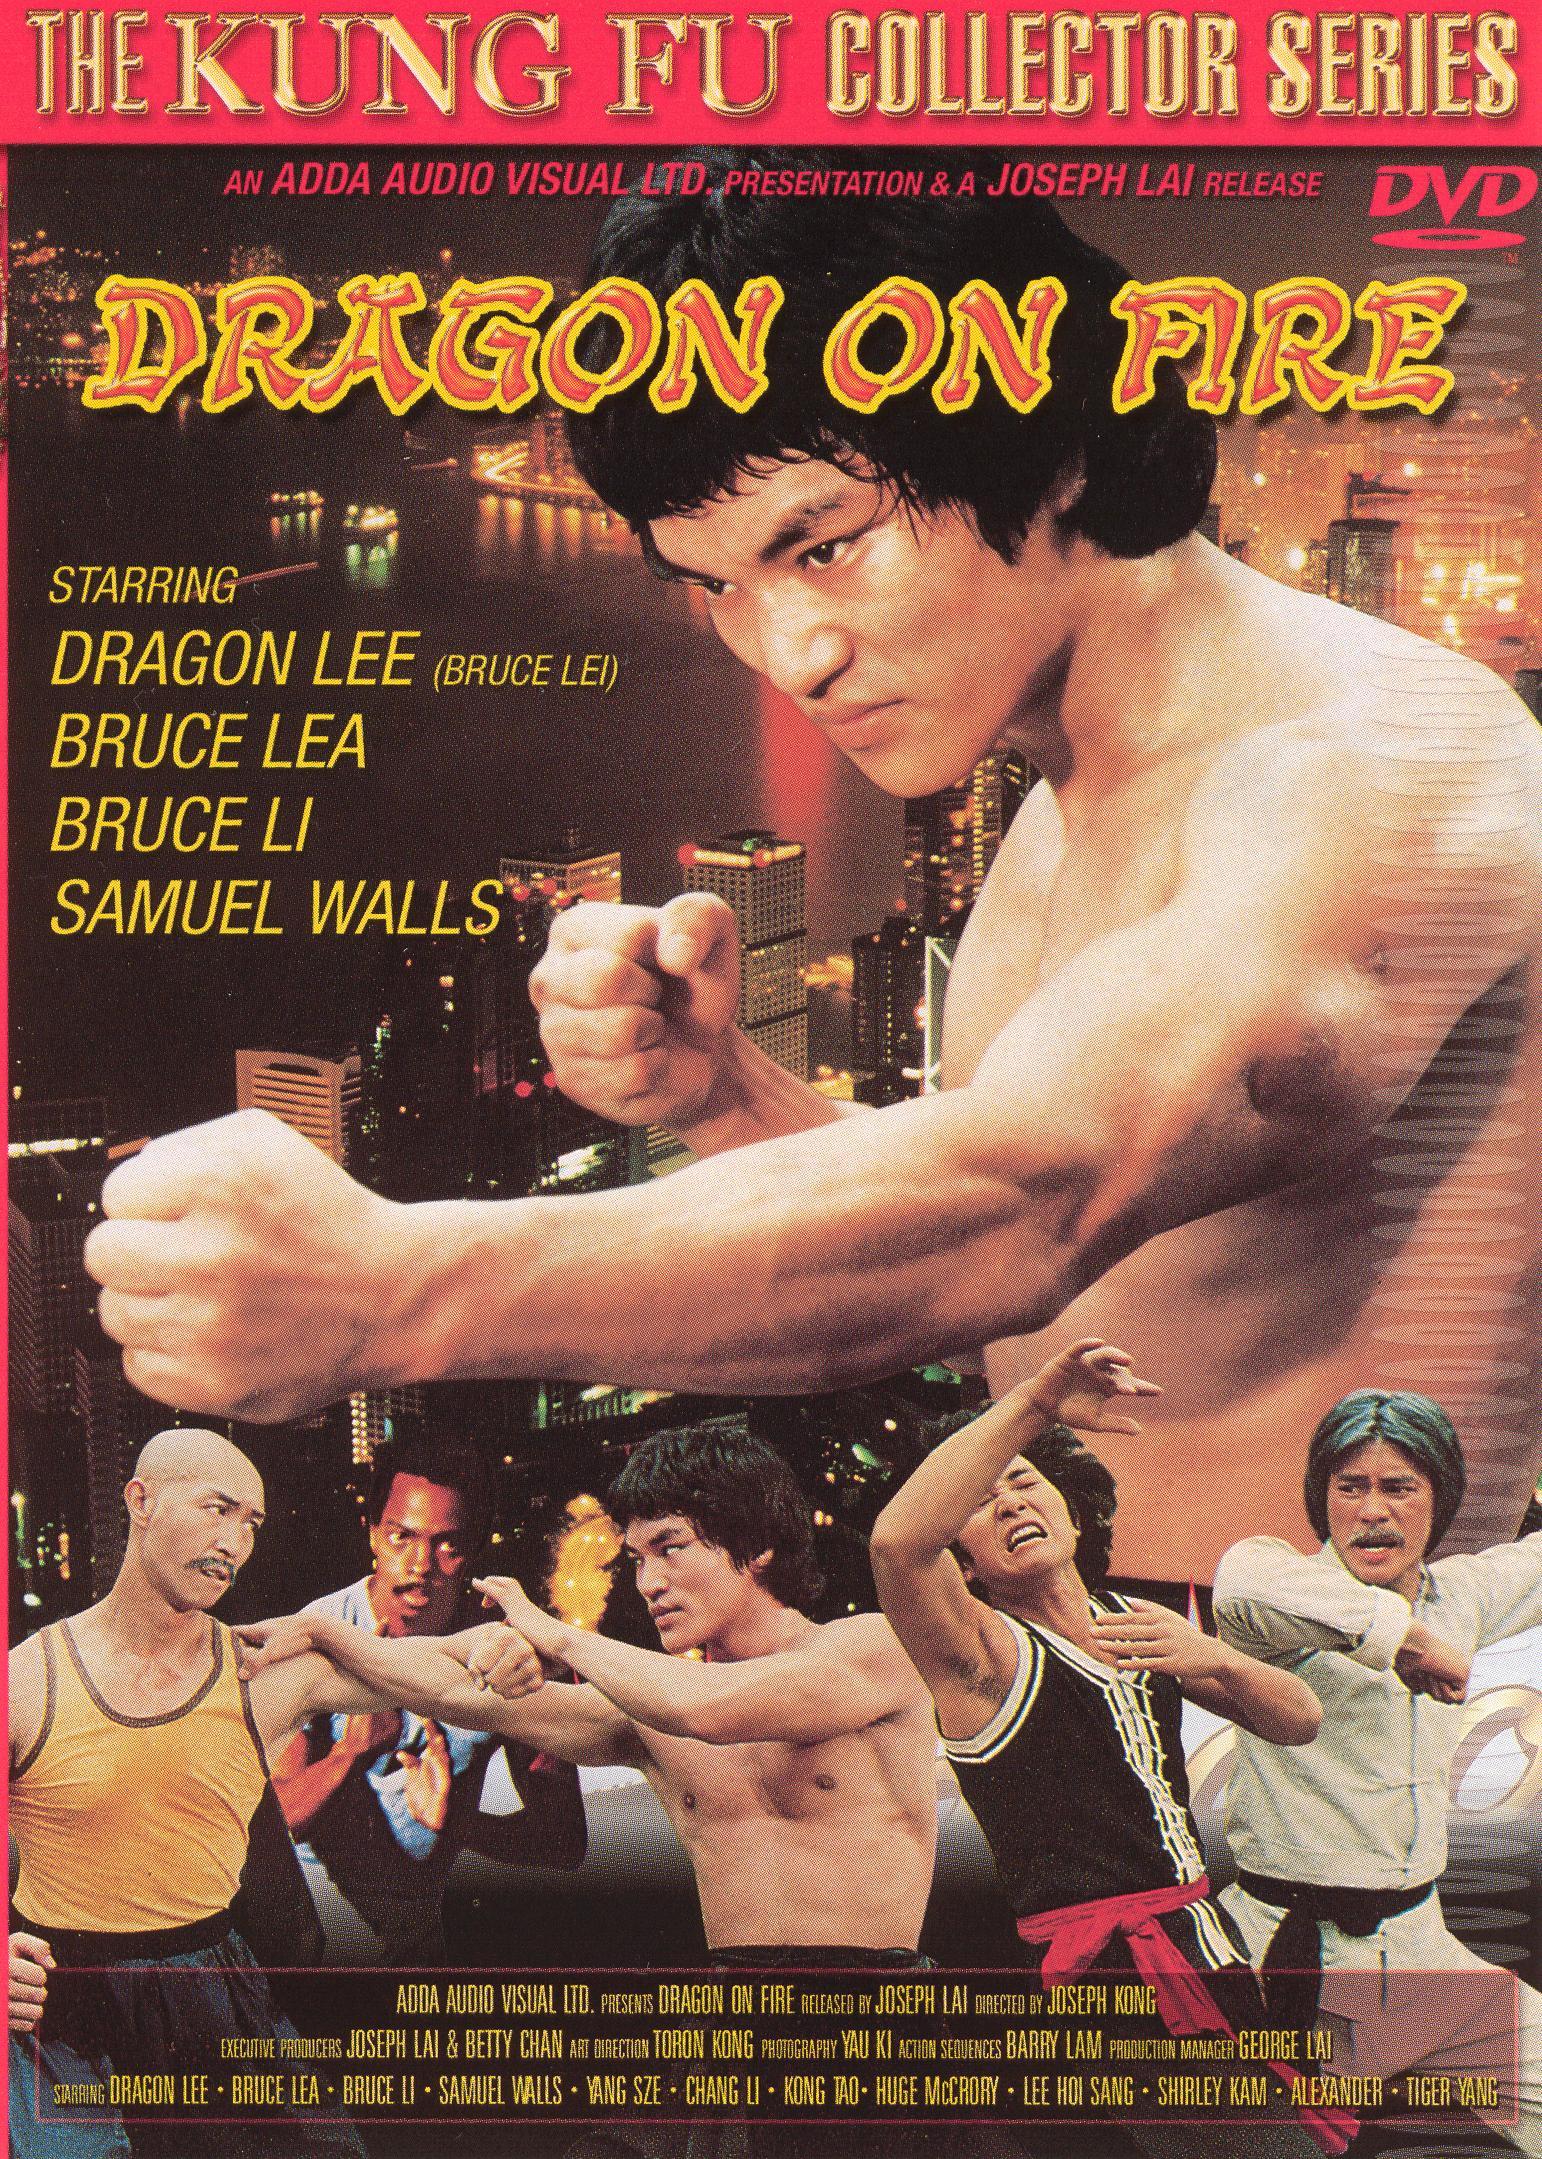 Dragon on Fire